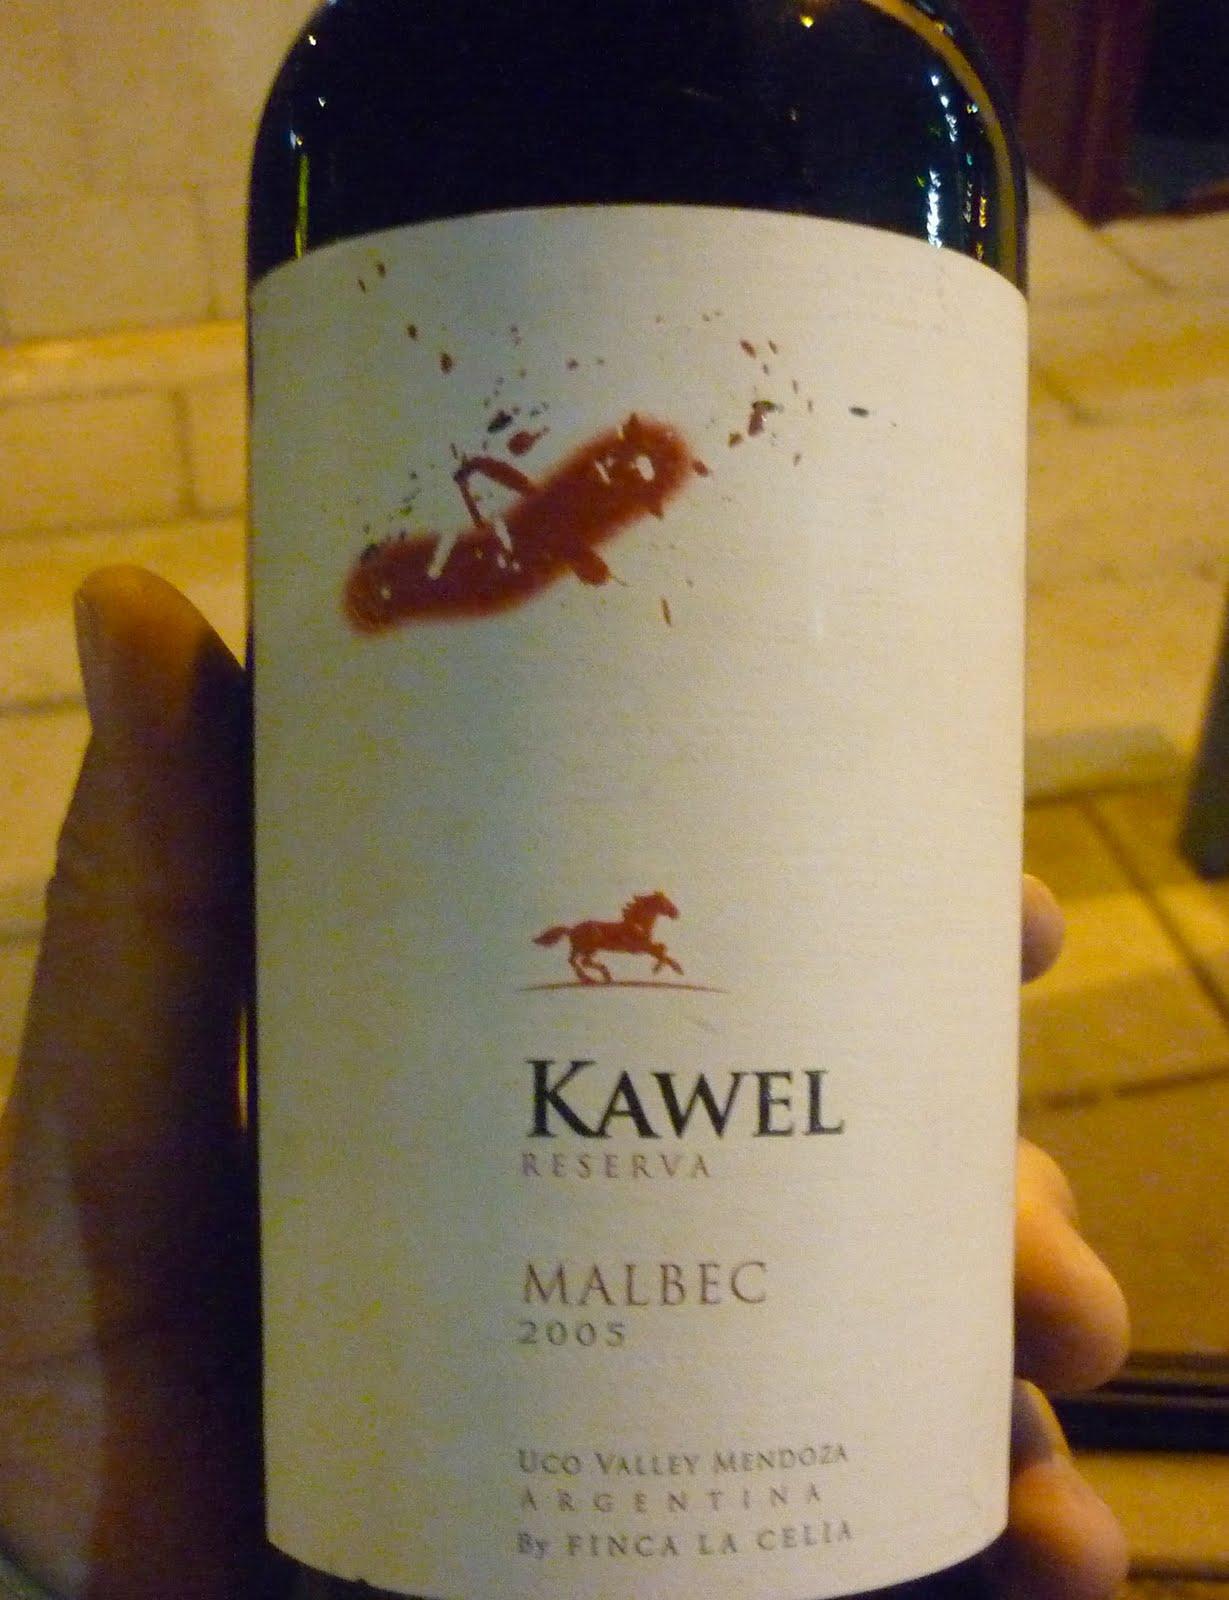 kawel%2Breserva%2B05 Kawel Reserva Malbec 2005 From Uco´s a deception